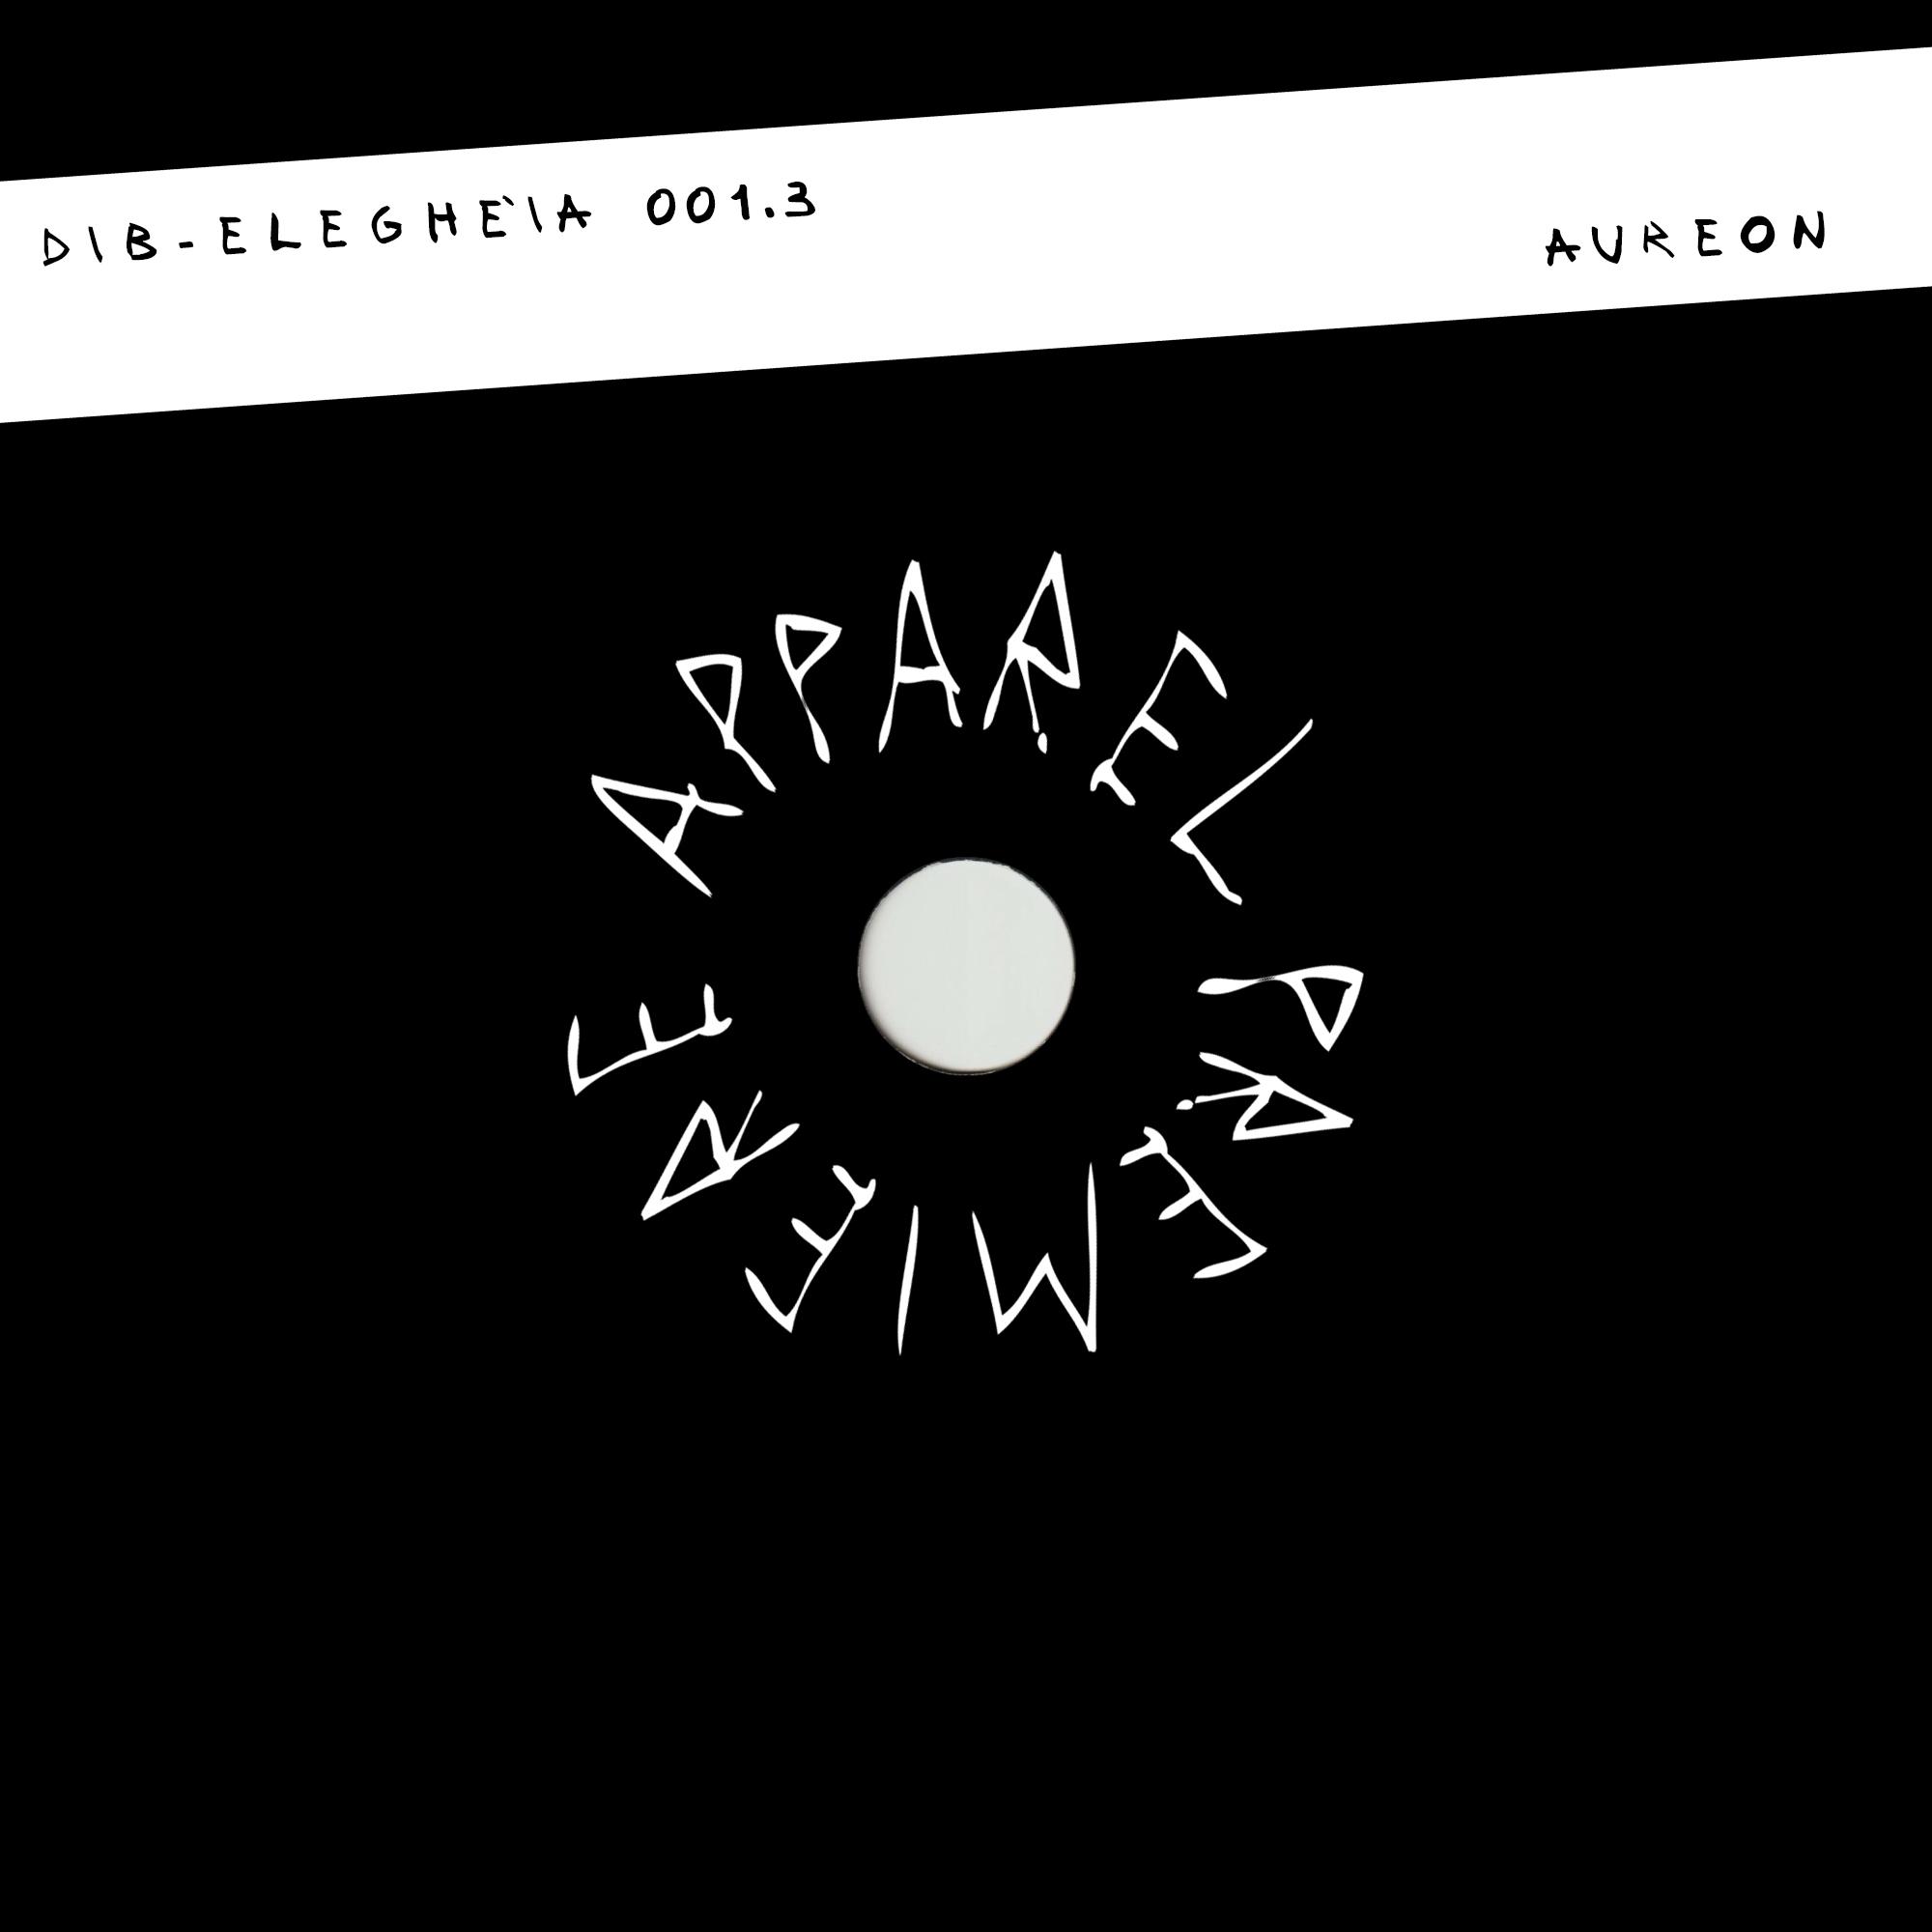 APPAREL PREMIERE Dib – Eleghéia 001.3 [Aureon]